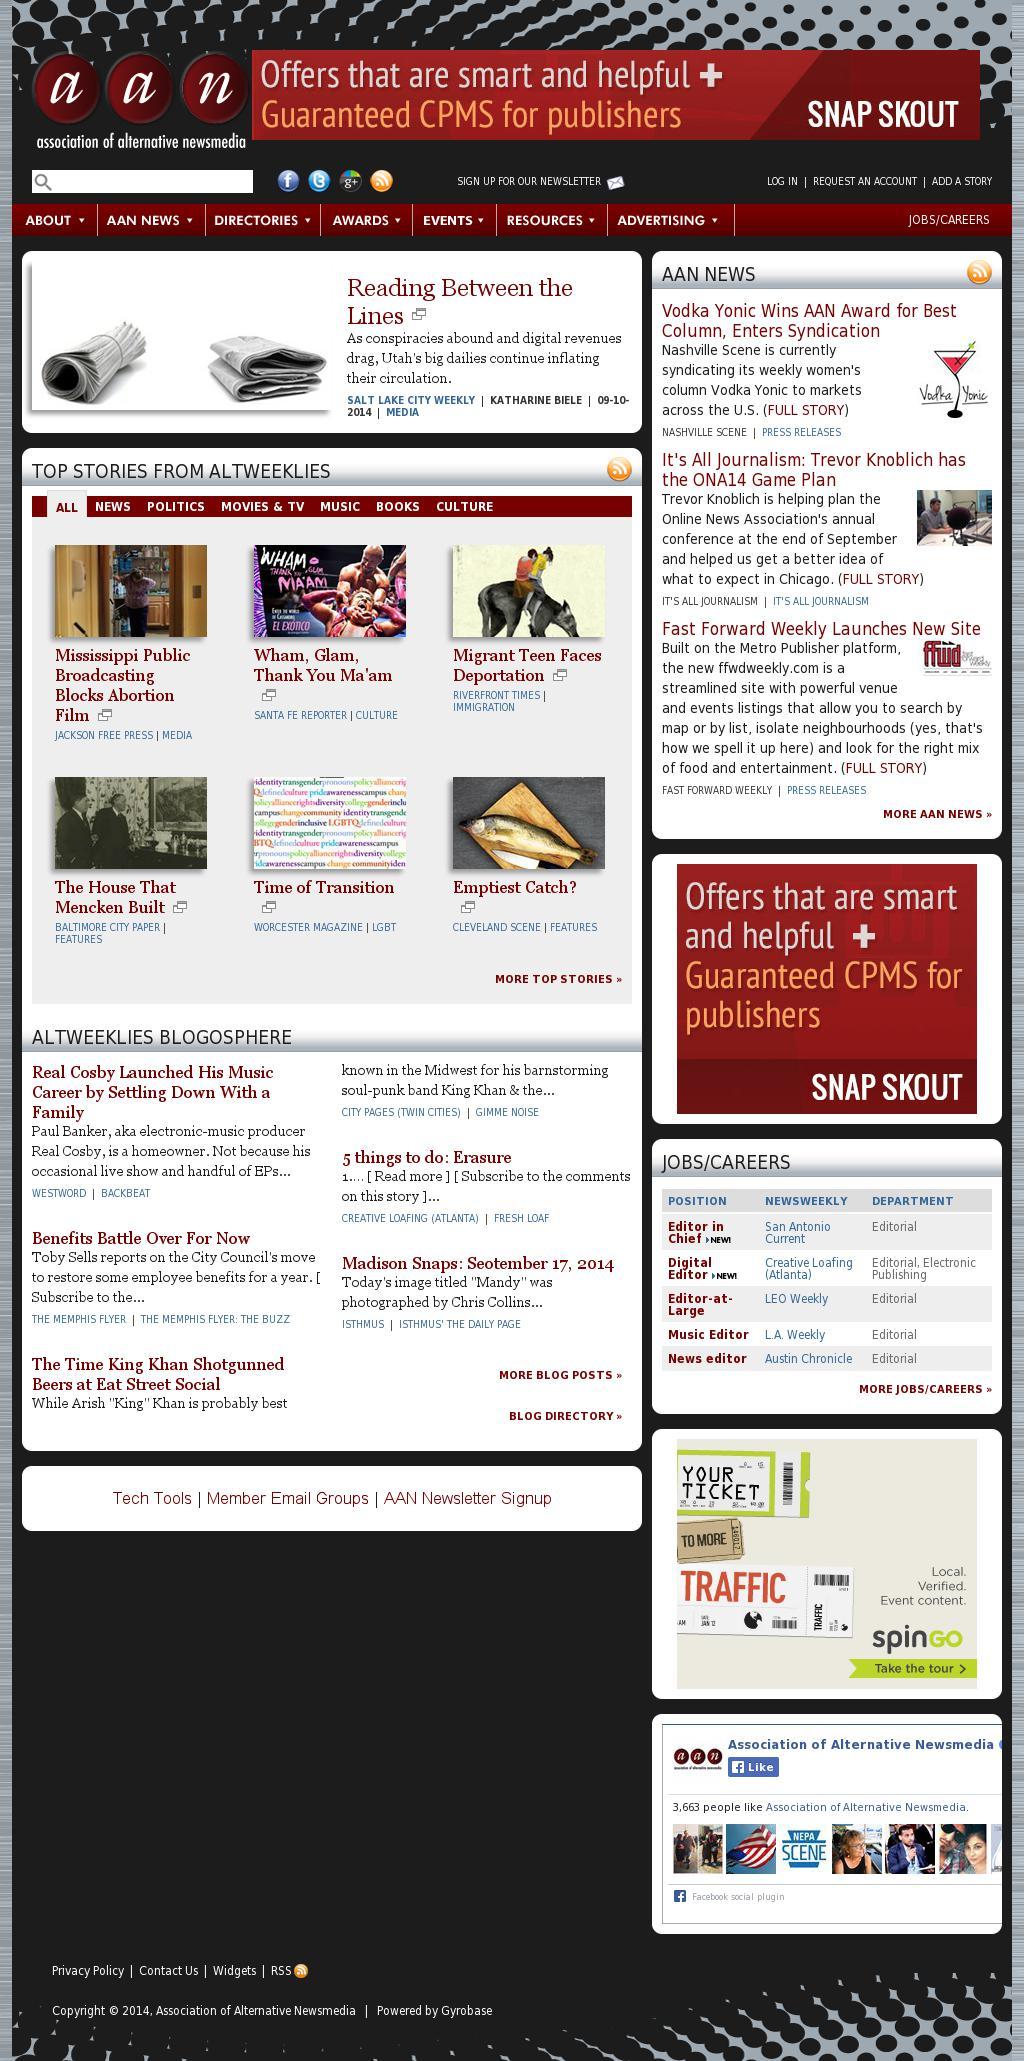 Association of Alternative Newsmedia at Wednesday Sept. 17, 2014, 1 p.m. UTC